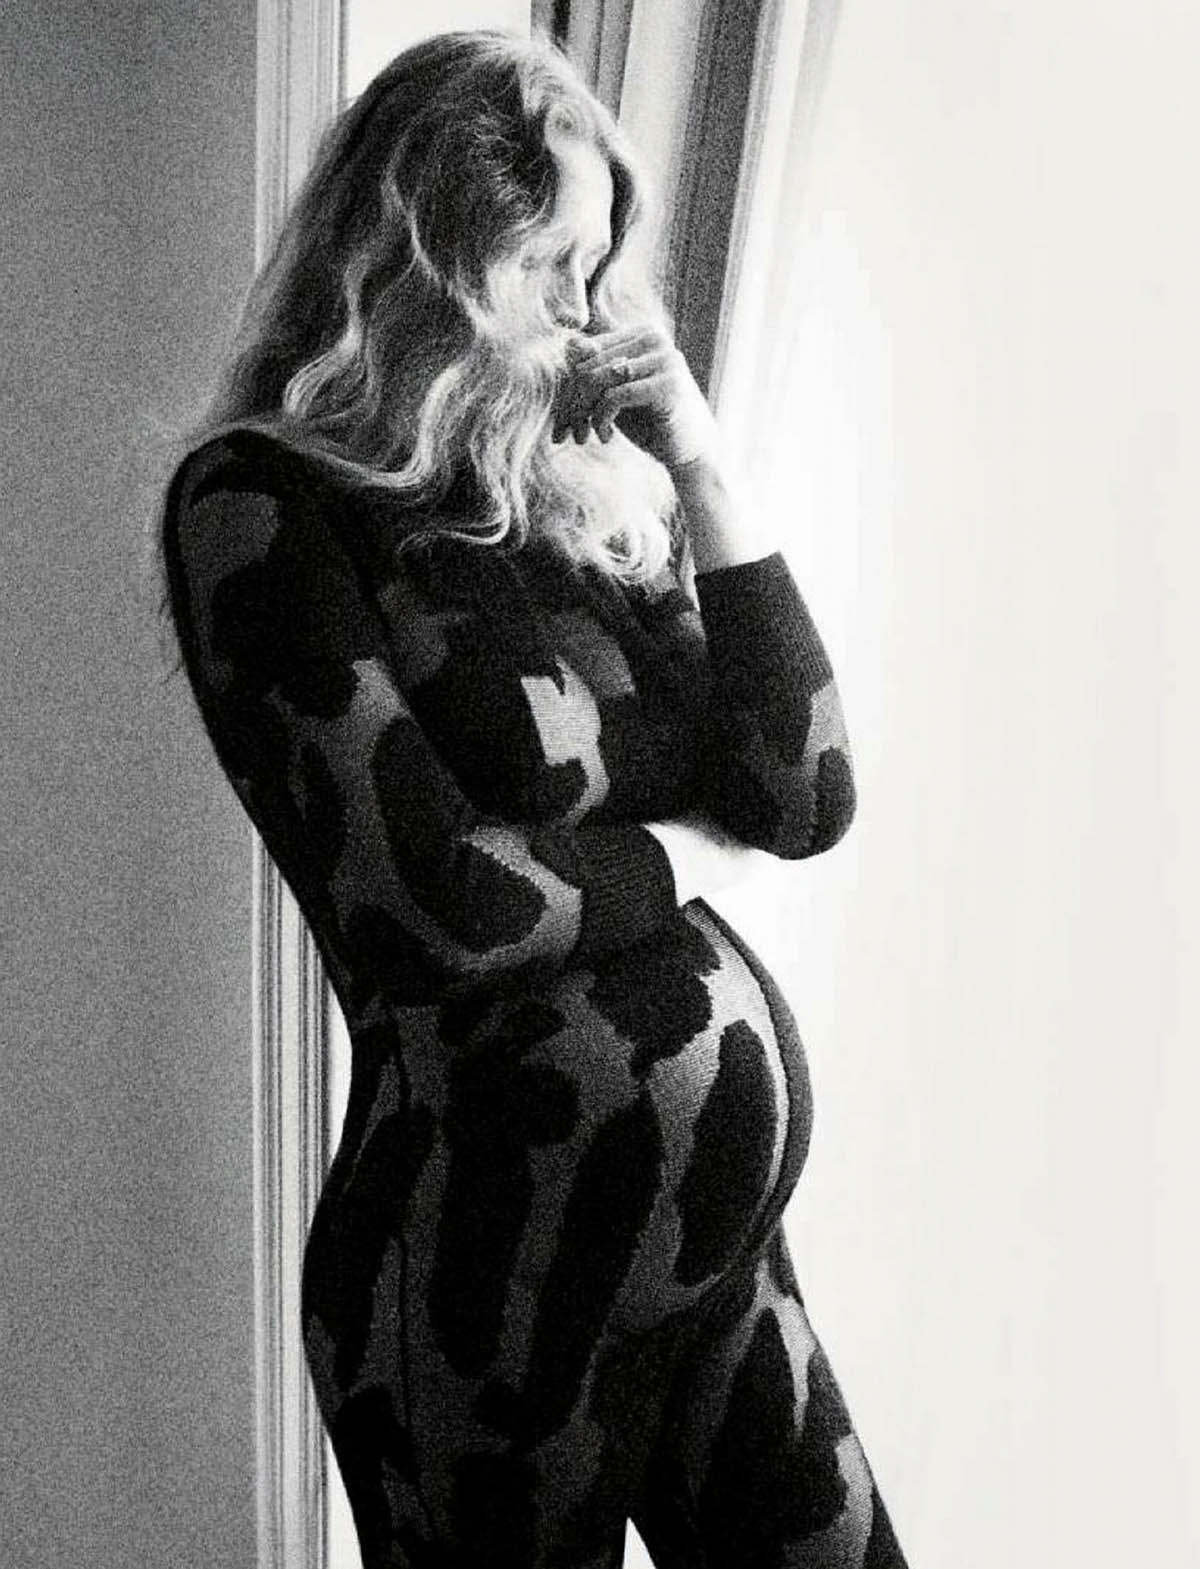 Toni Garrn covers Vogue Germany May June 2021 by Camilla Akrans